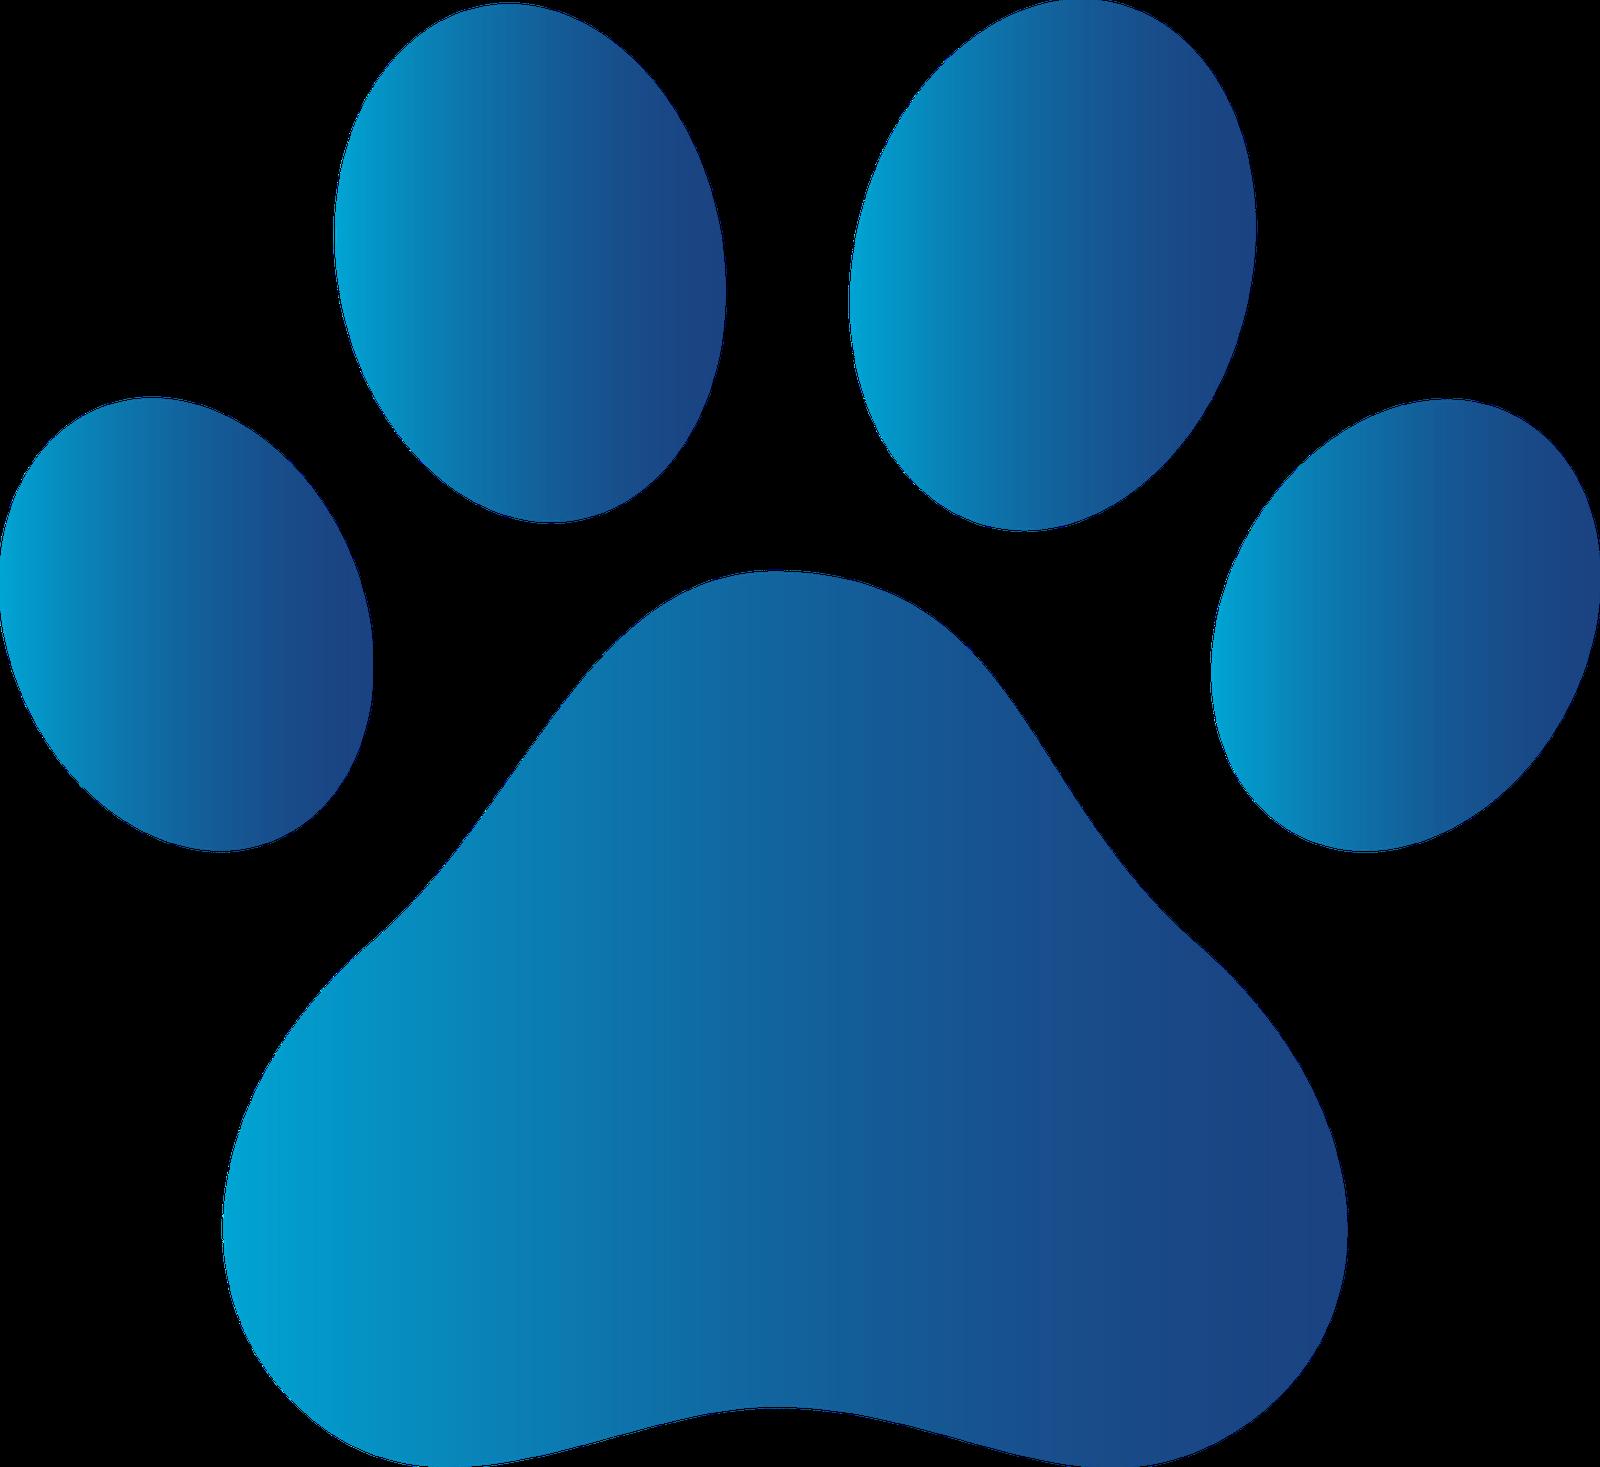 Colorful Foot Prints Logo